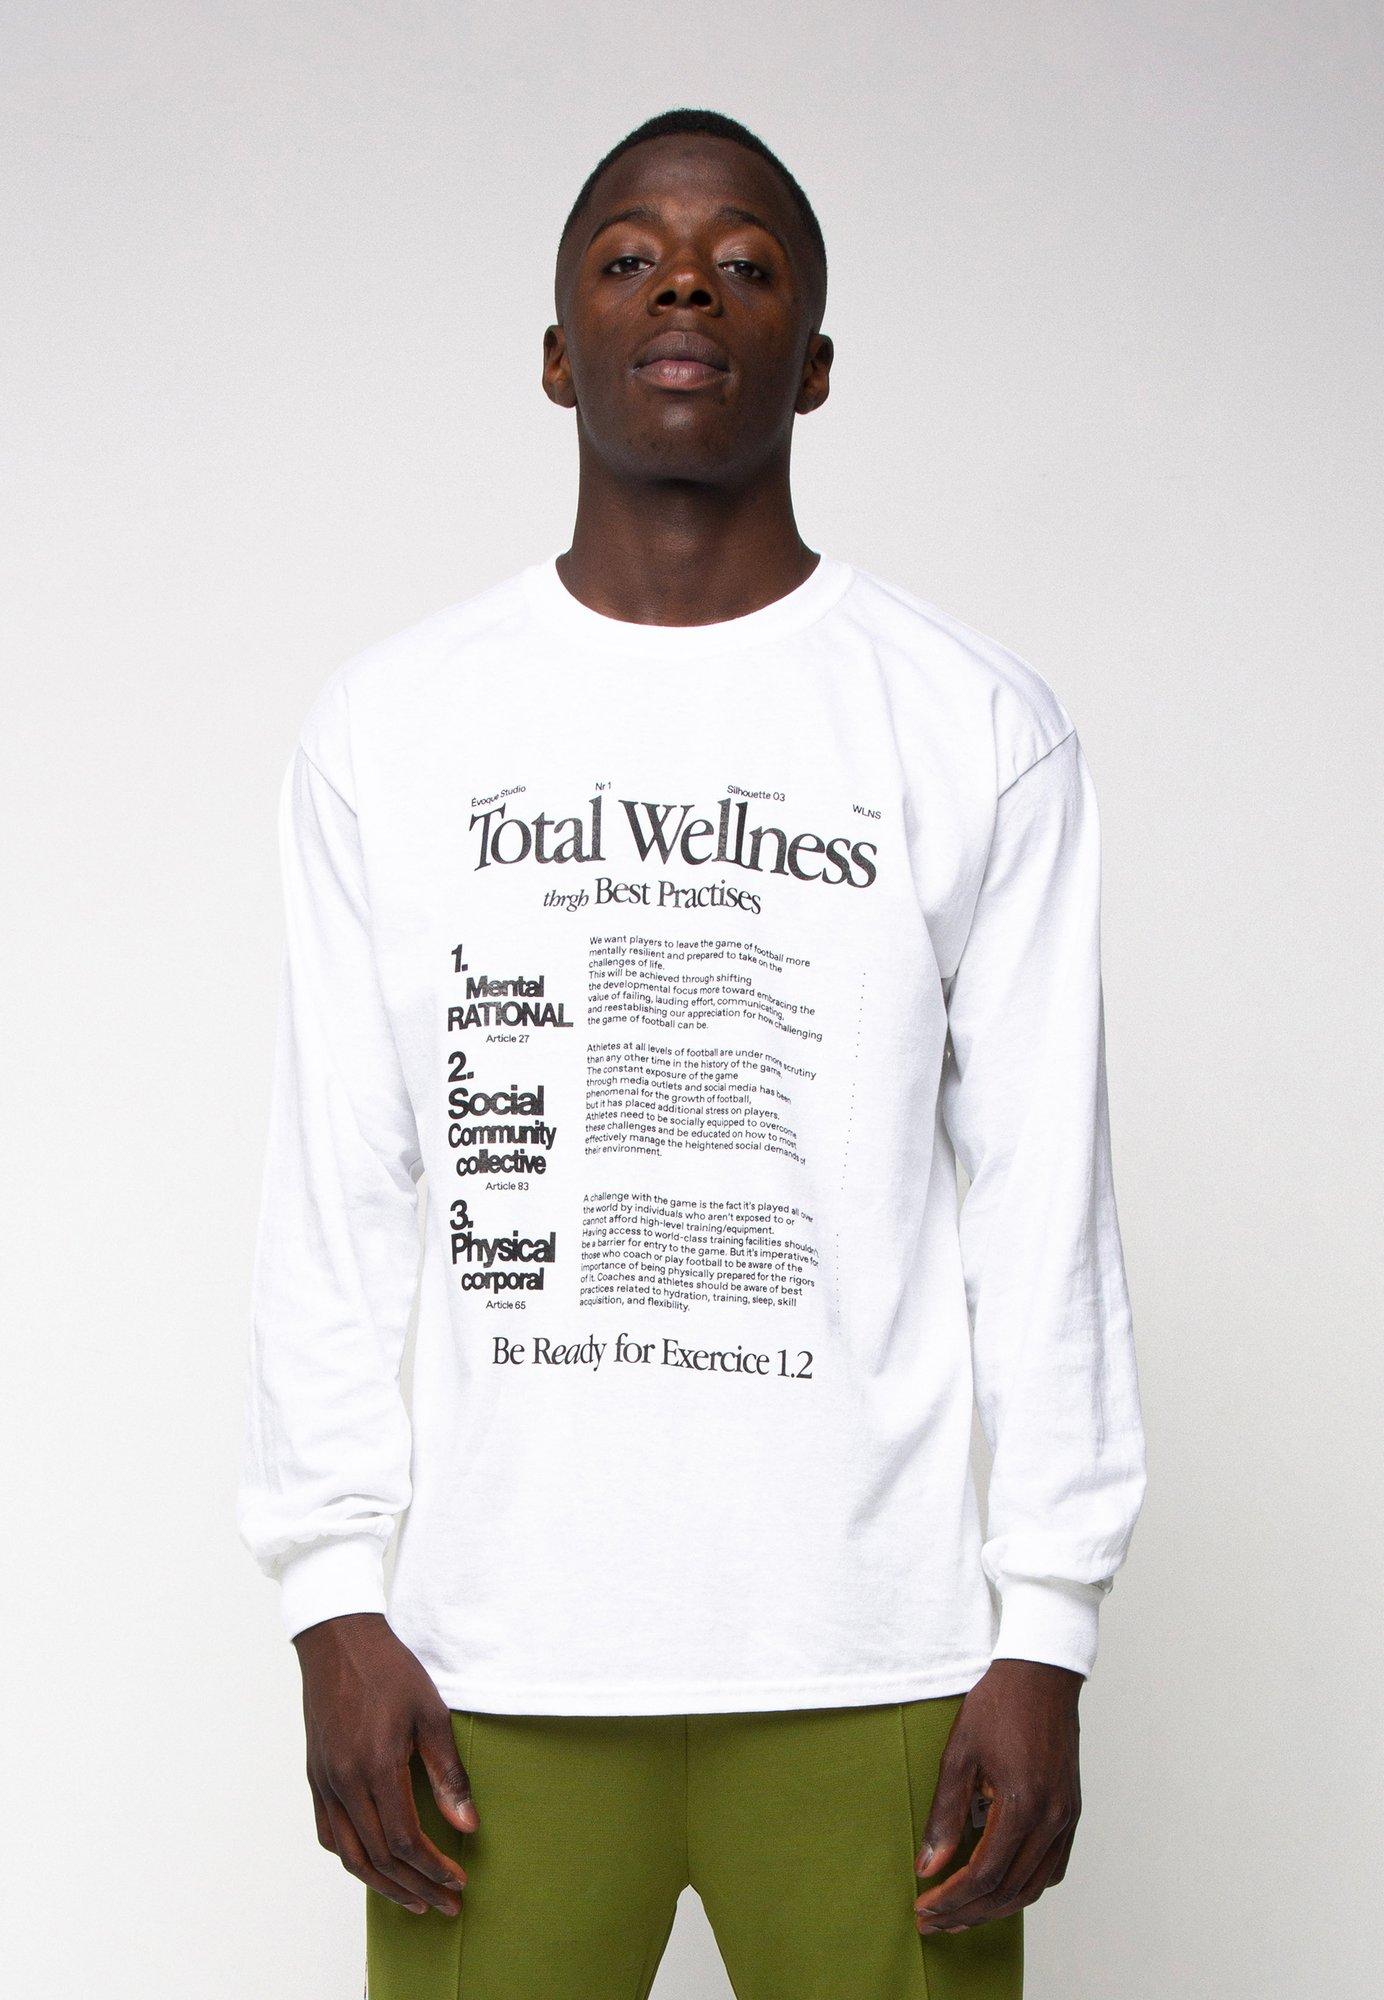 Image of Wellness T-shirt